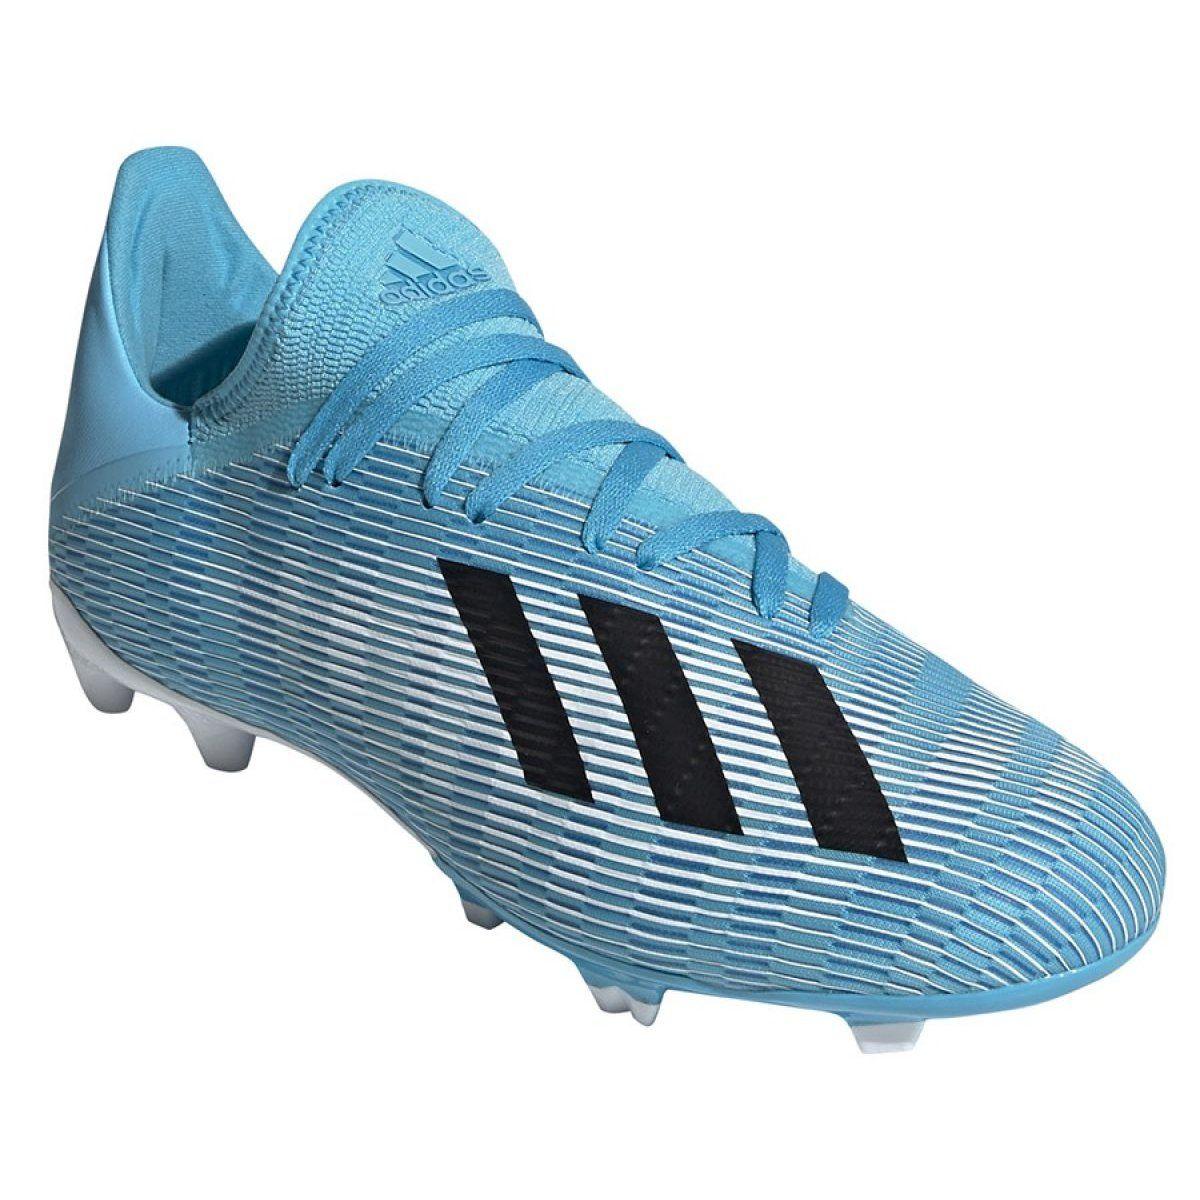 Buty Pilkarskie Adidas X 19 3 Fg M F35383 Niebieskie Szare Football Boots Adidas Adidas Football